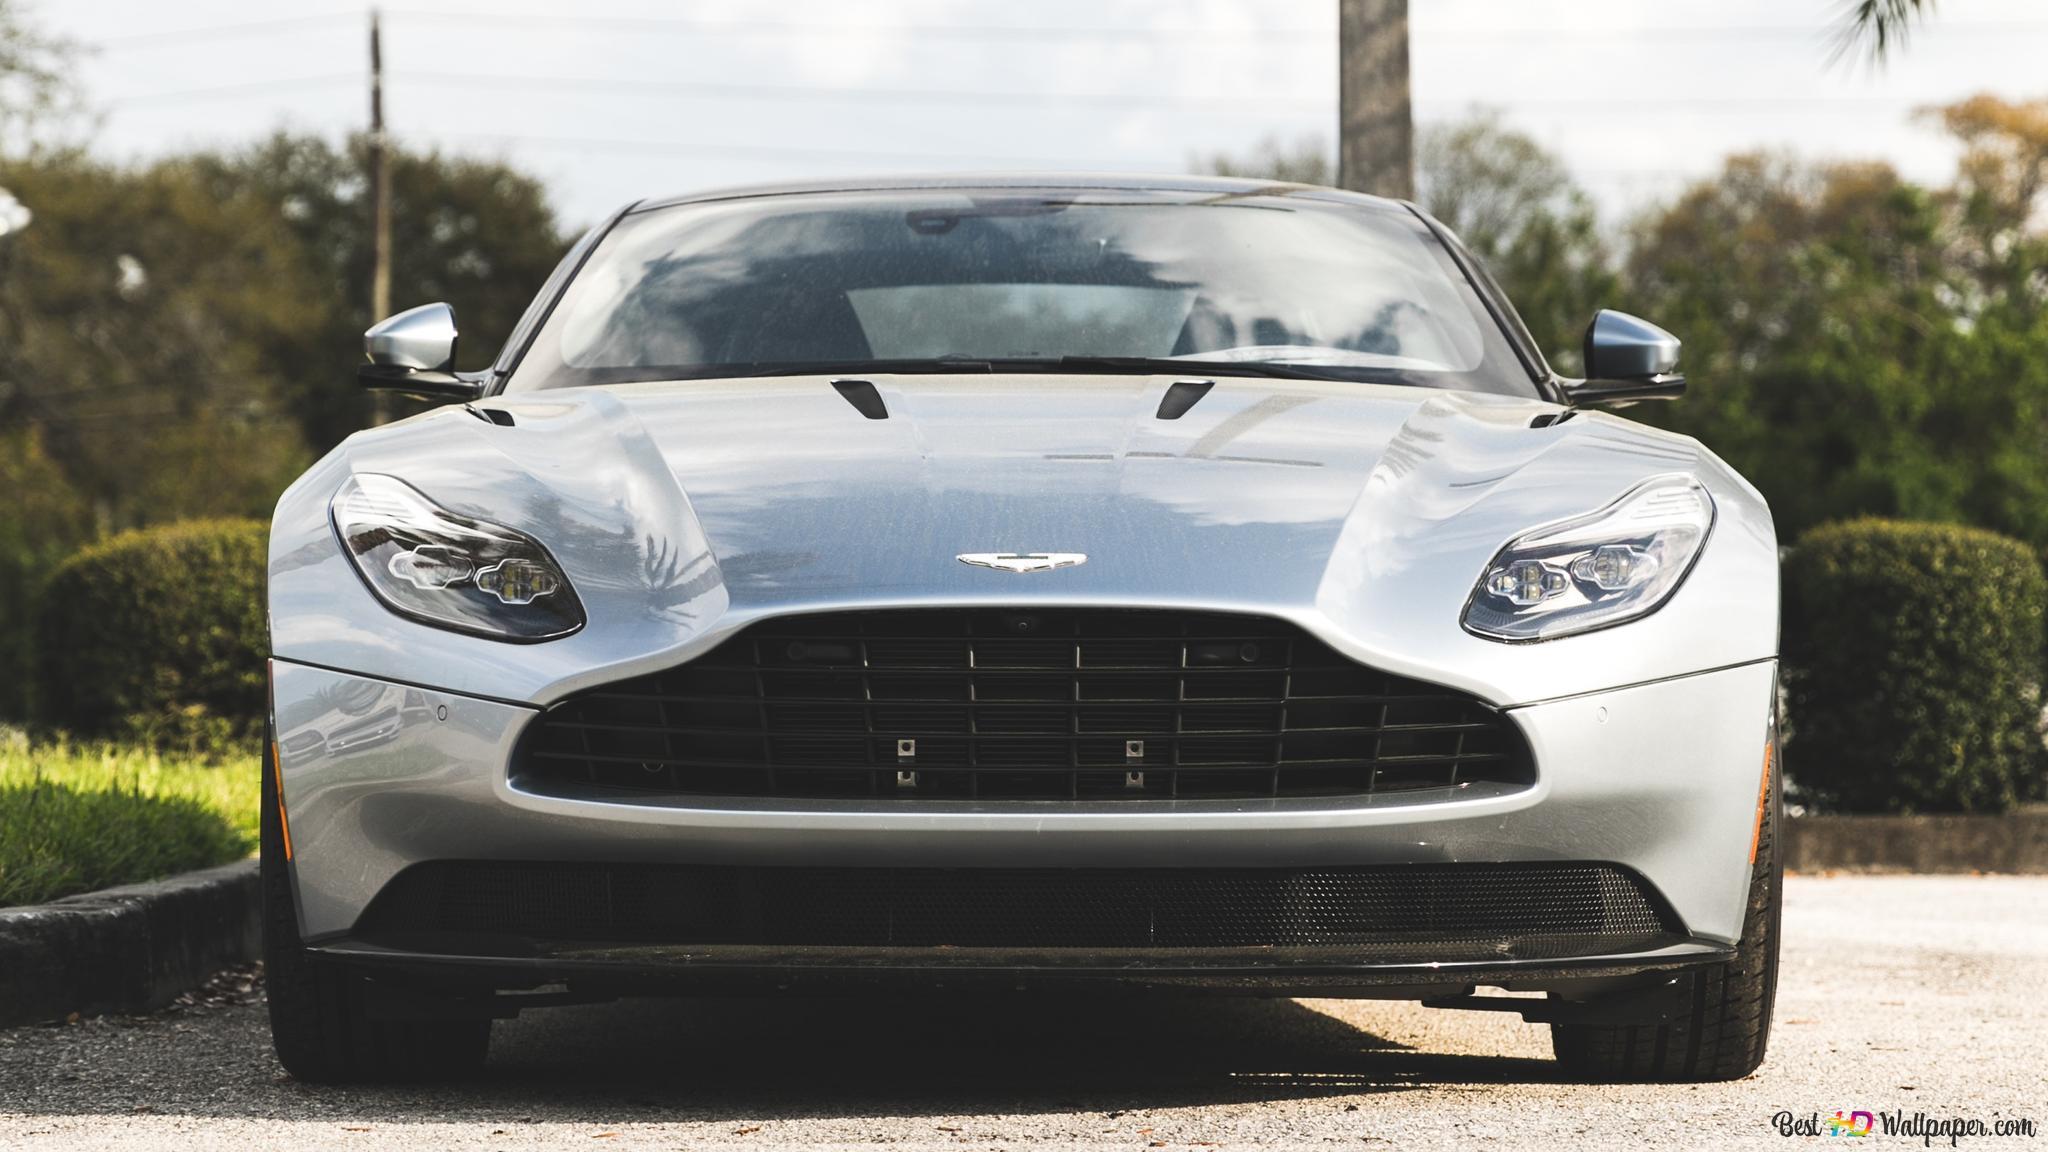 Silver Aston Martin Db11 Sport Car Hd Wallpaper Download